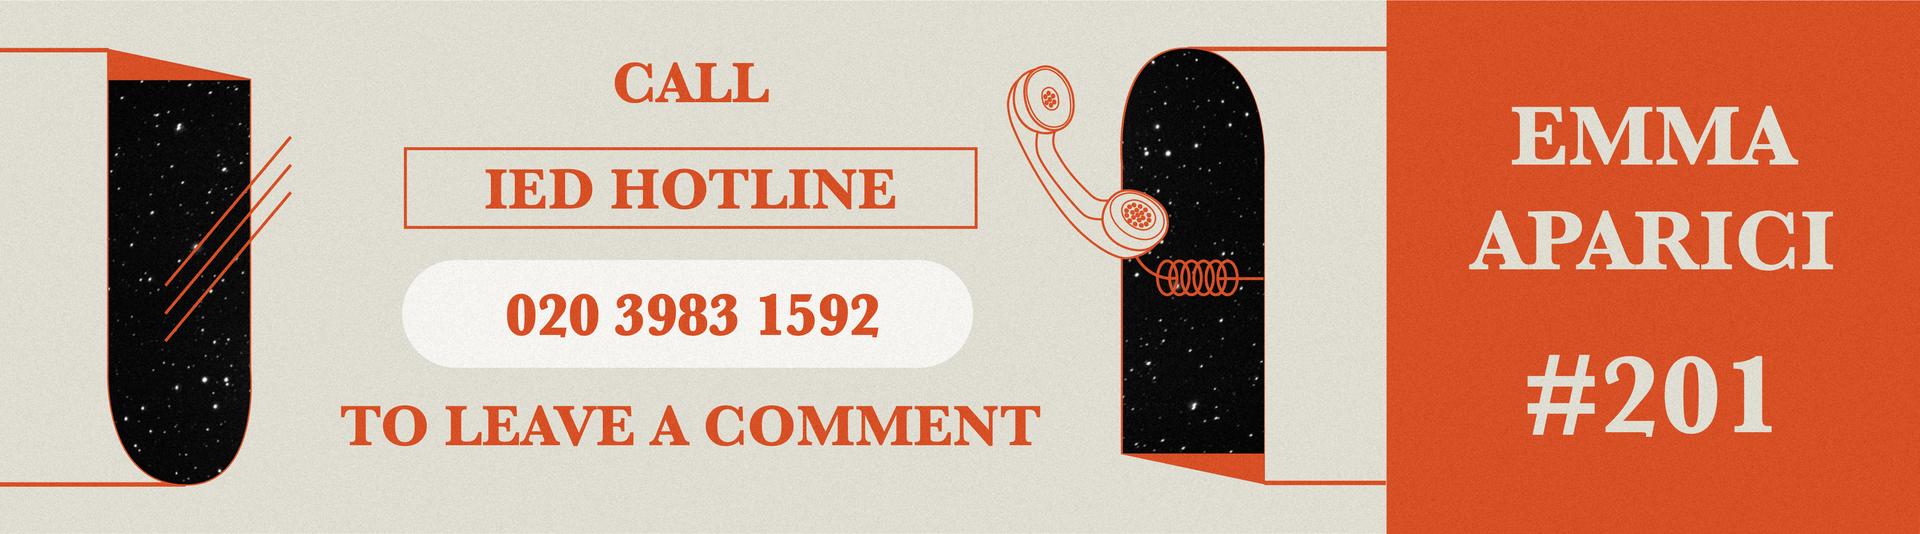 IED hotline extension number #201